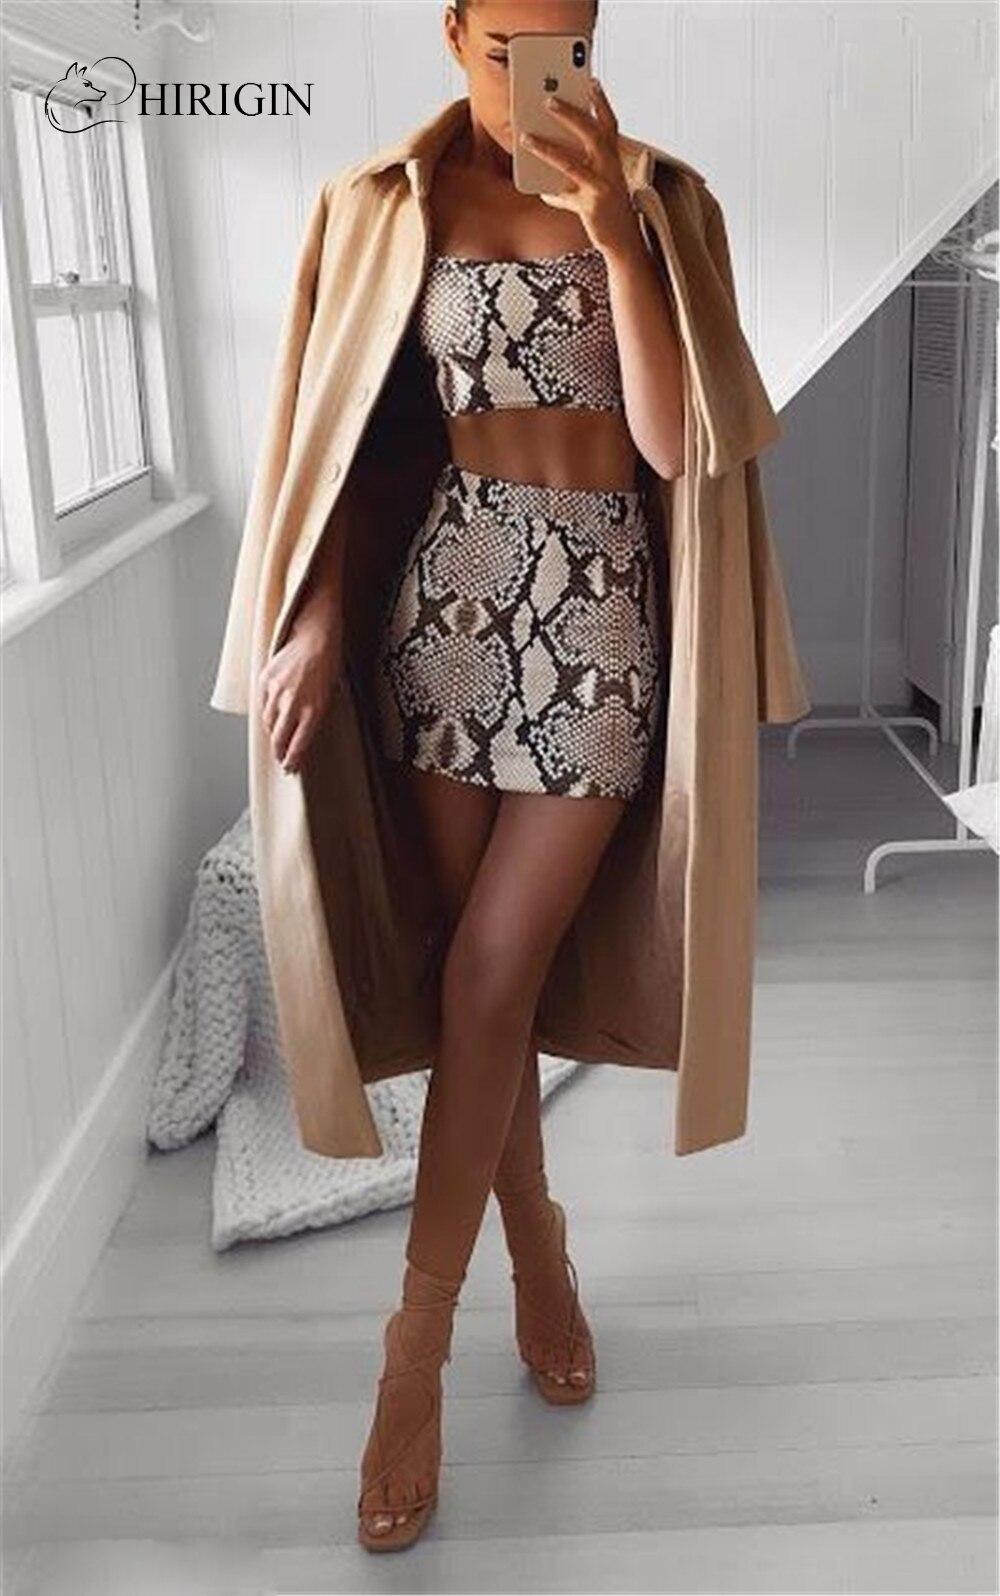 Hirigin Women 2 Piece Set Women 2020 New Fashion Snake Print Clothes Summer Crop Top Set Sexy Bodycon Mini Dress